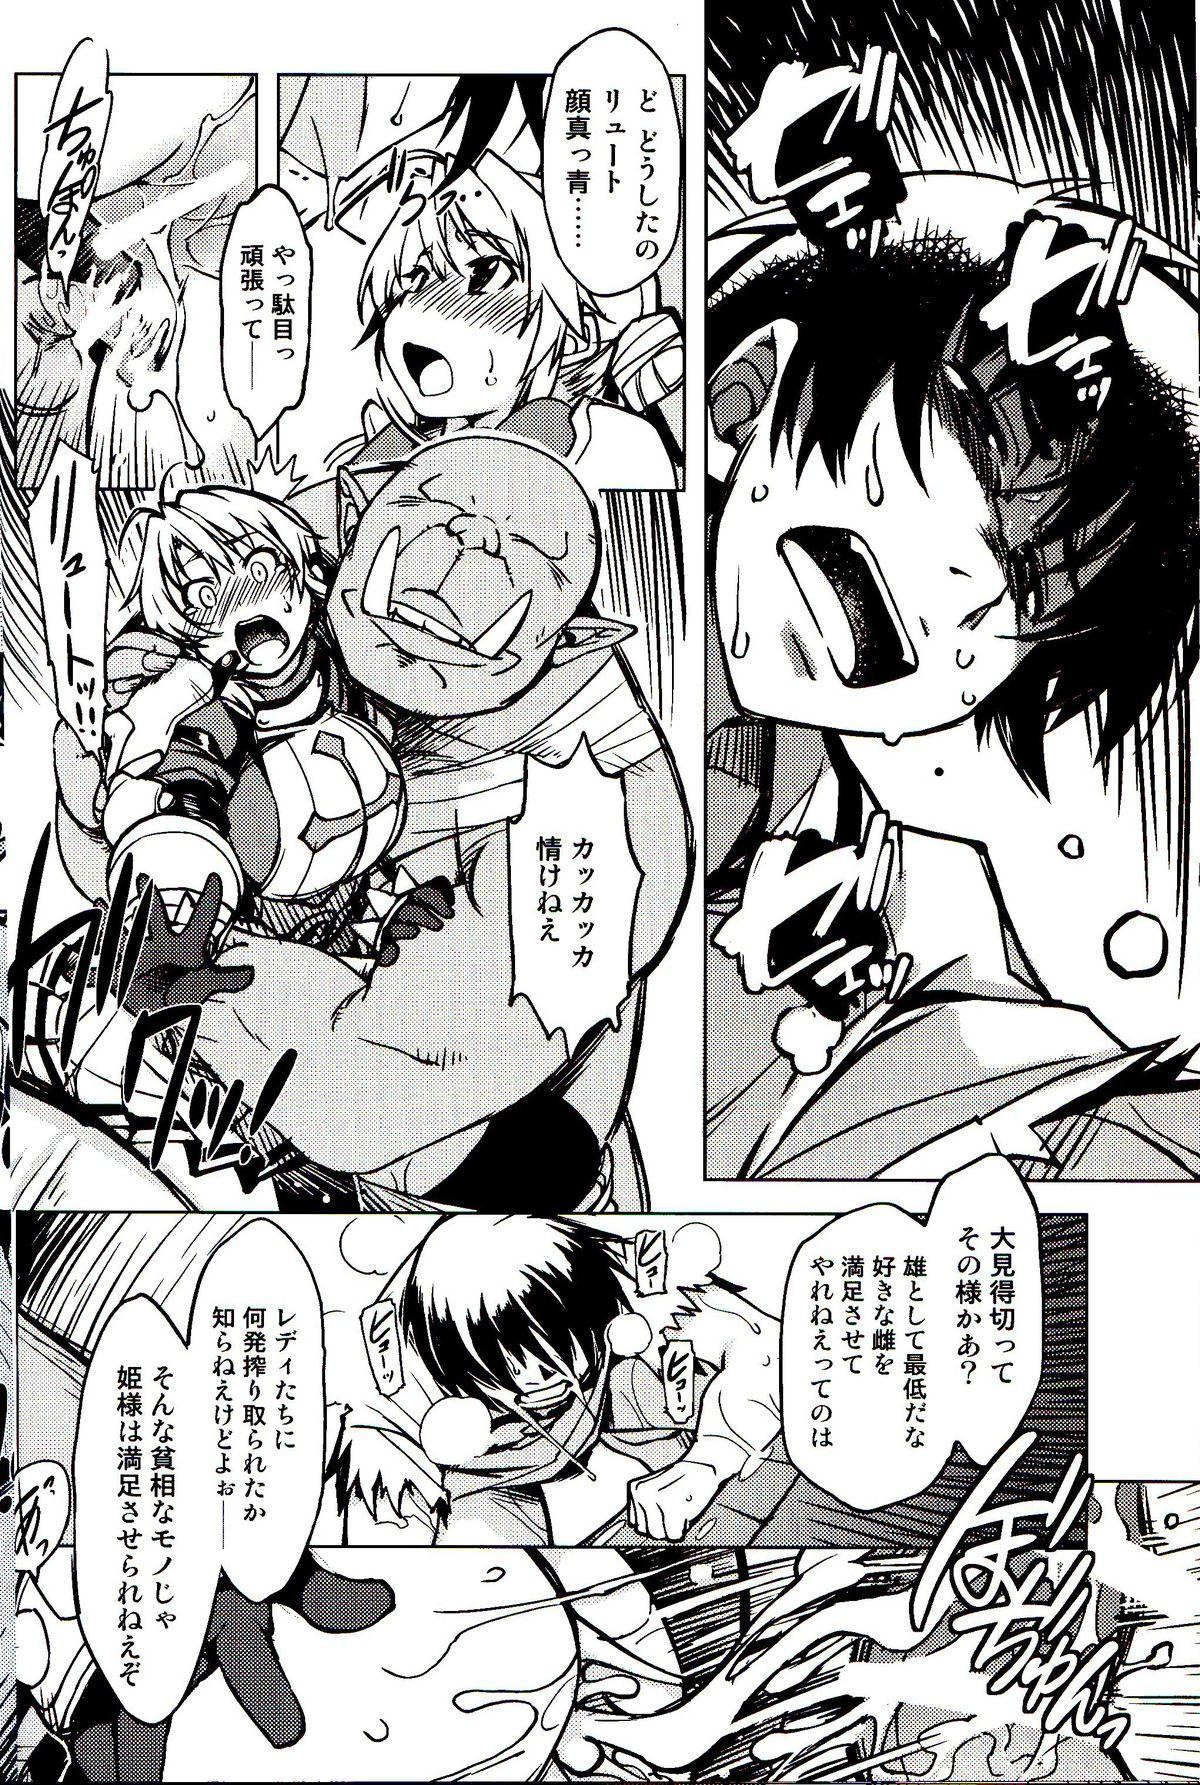 Hime Kishi Tame 3 13